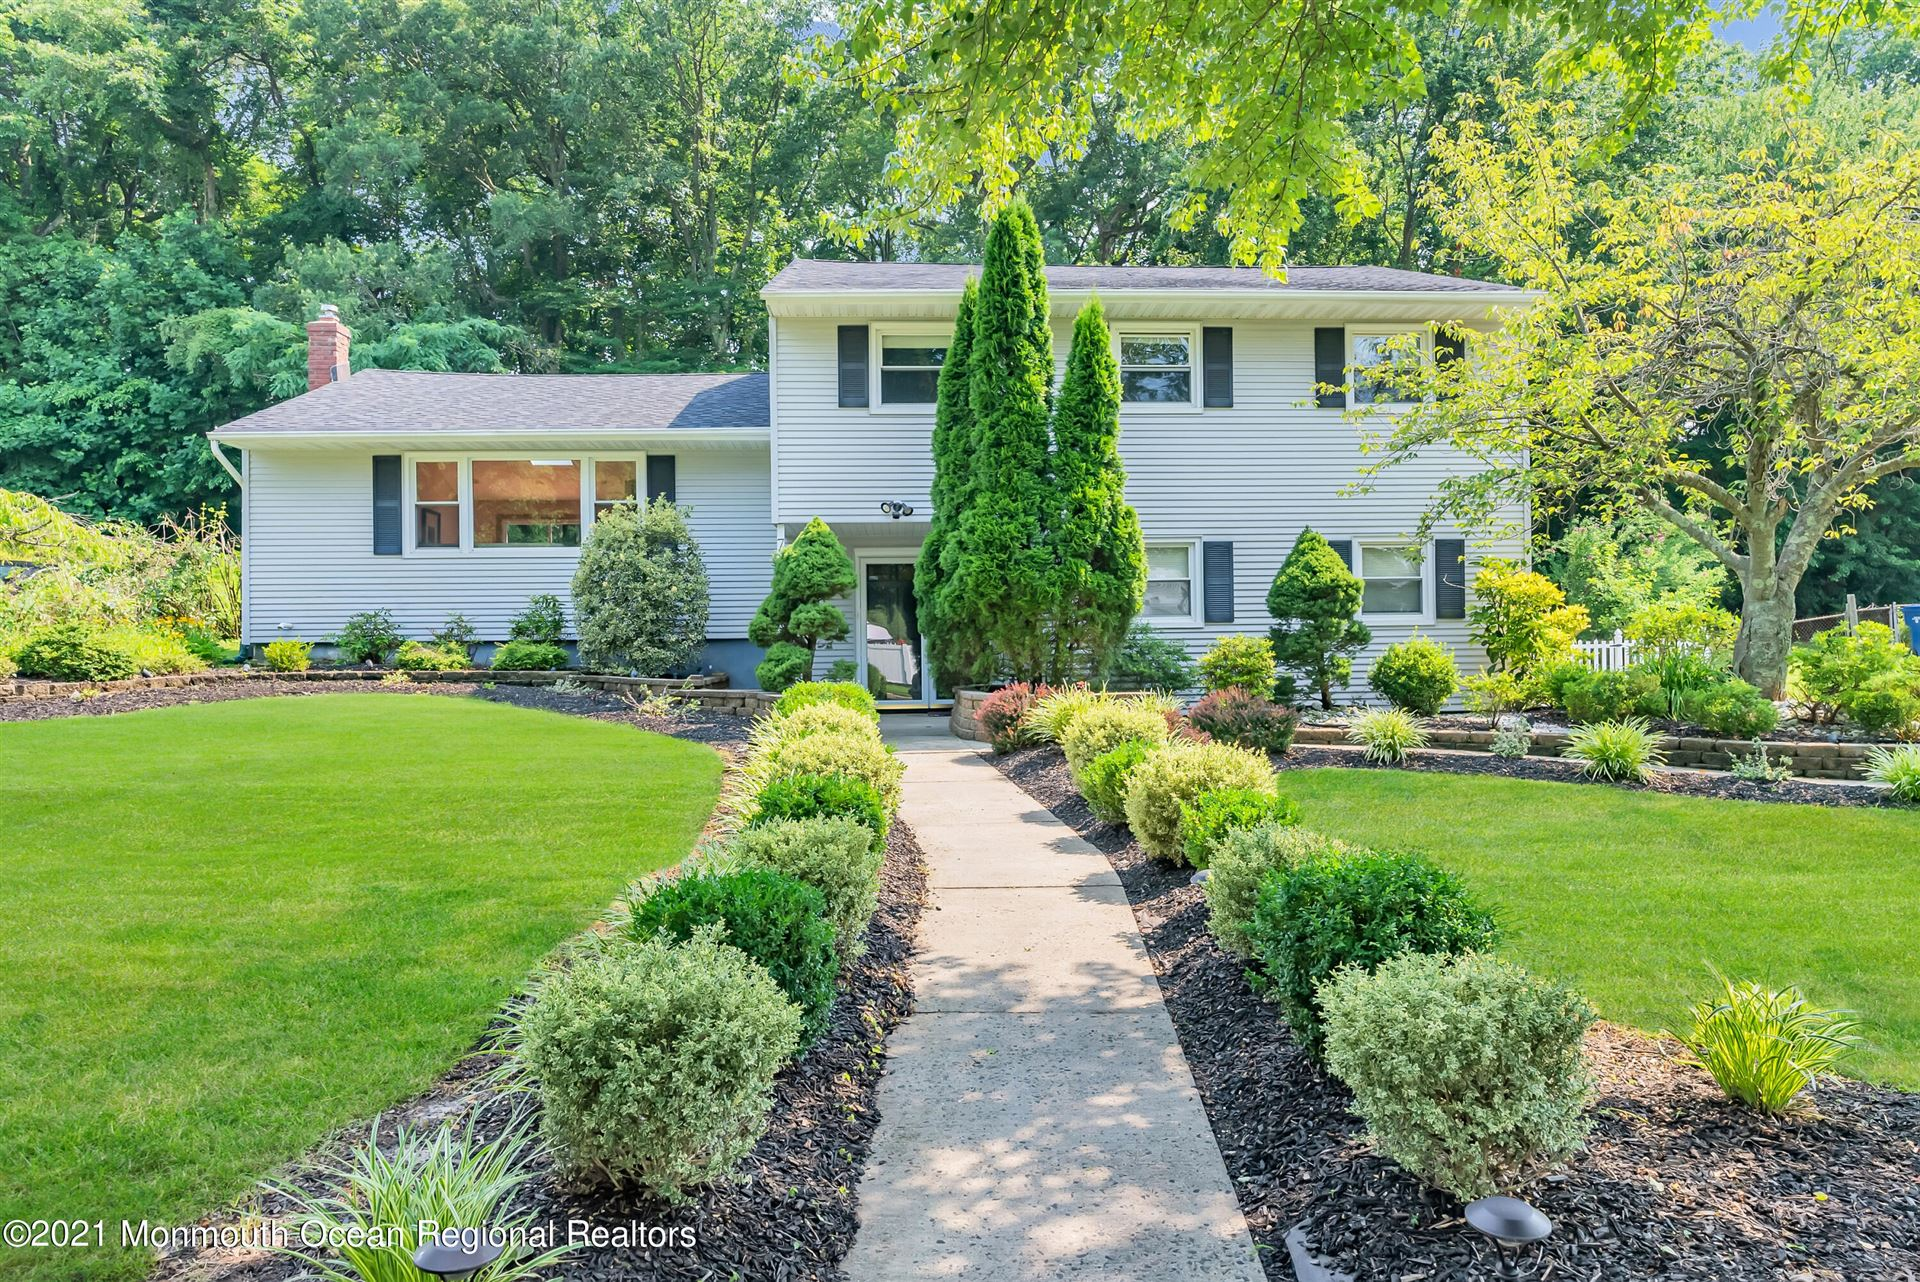 7 Hillside Terrace, Ocean Township, NJ 07712 - MLS#: 22123121